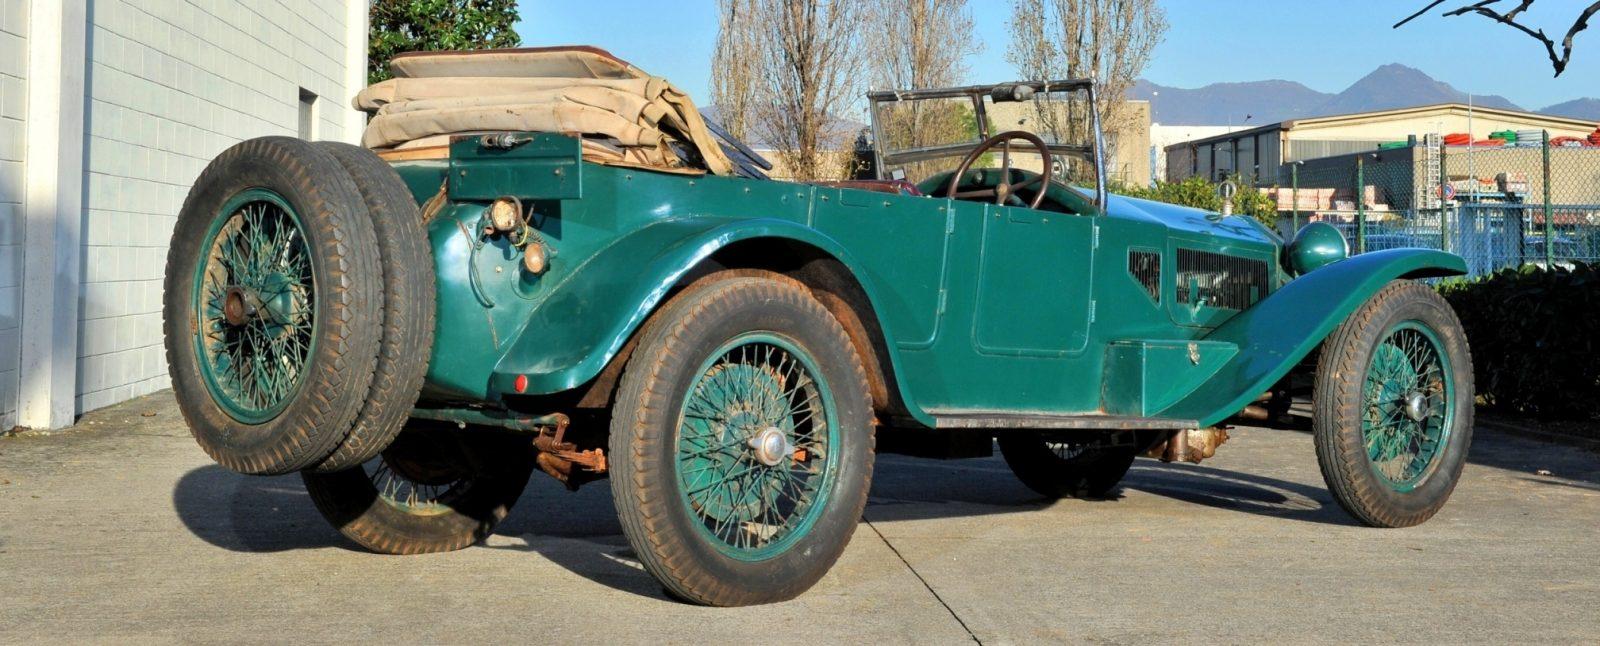 Wealth Dreams -- 1930 Lancia Lambda 8 Sports Tourer Seeks New Home -- My Home 16